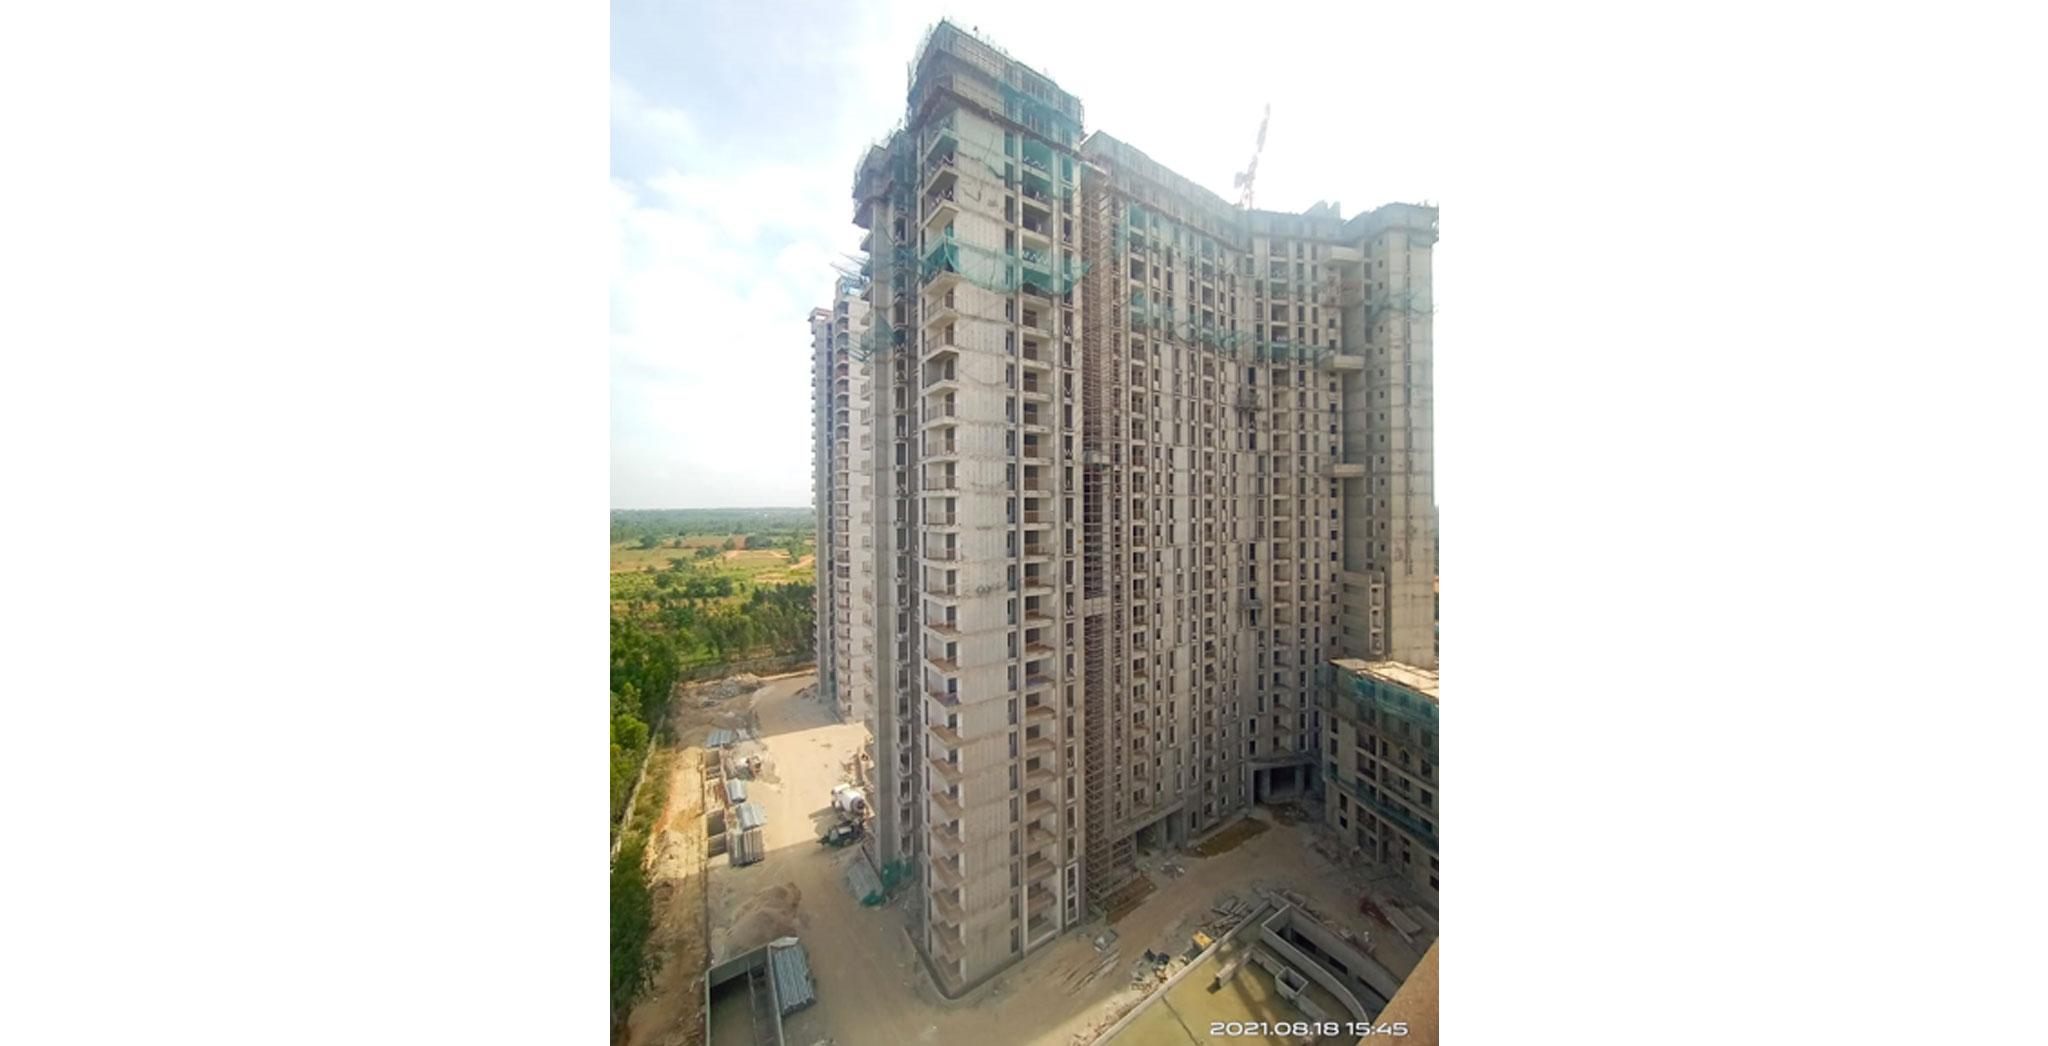 Aug 2021 - Serene Tower/Wing D: Casting of Terrace Floor Slab